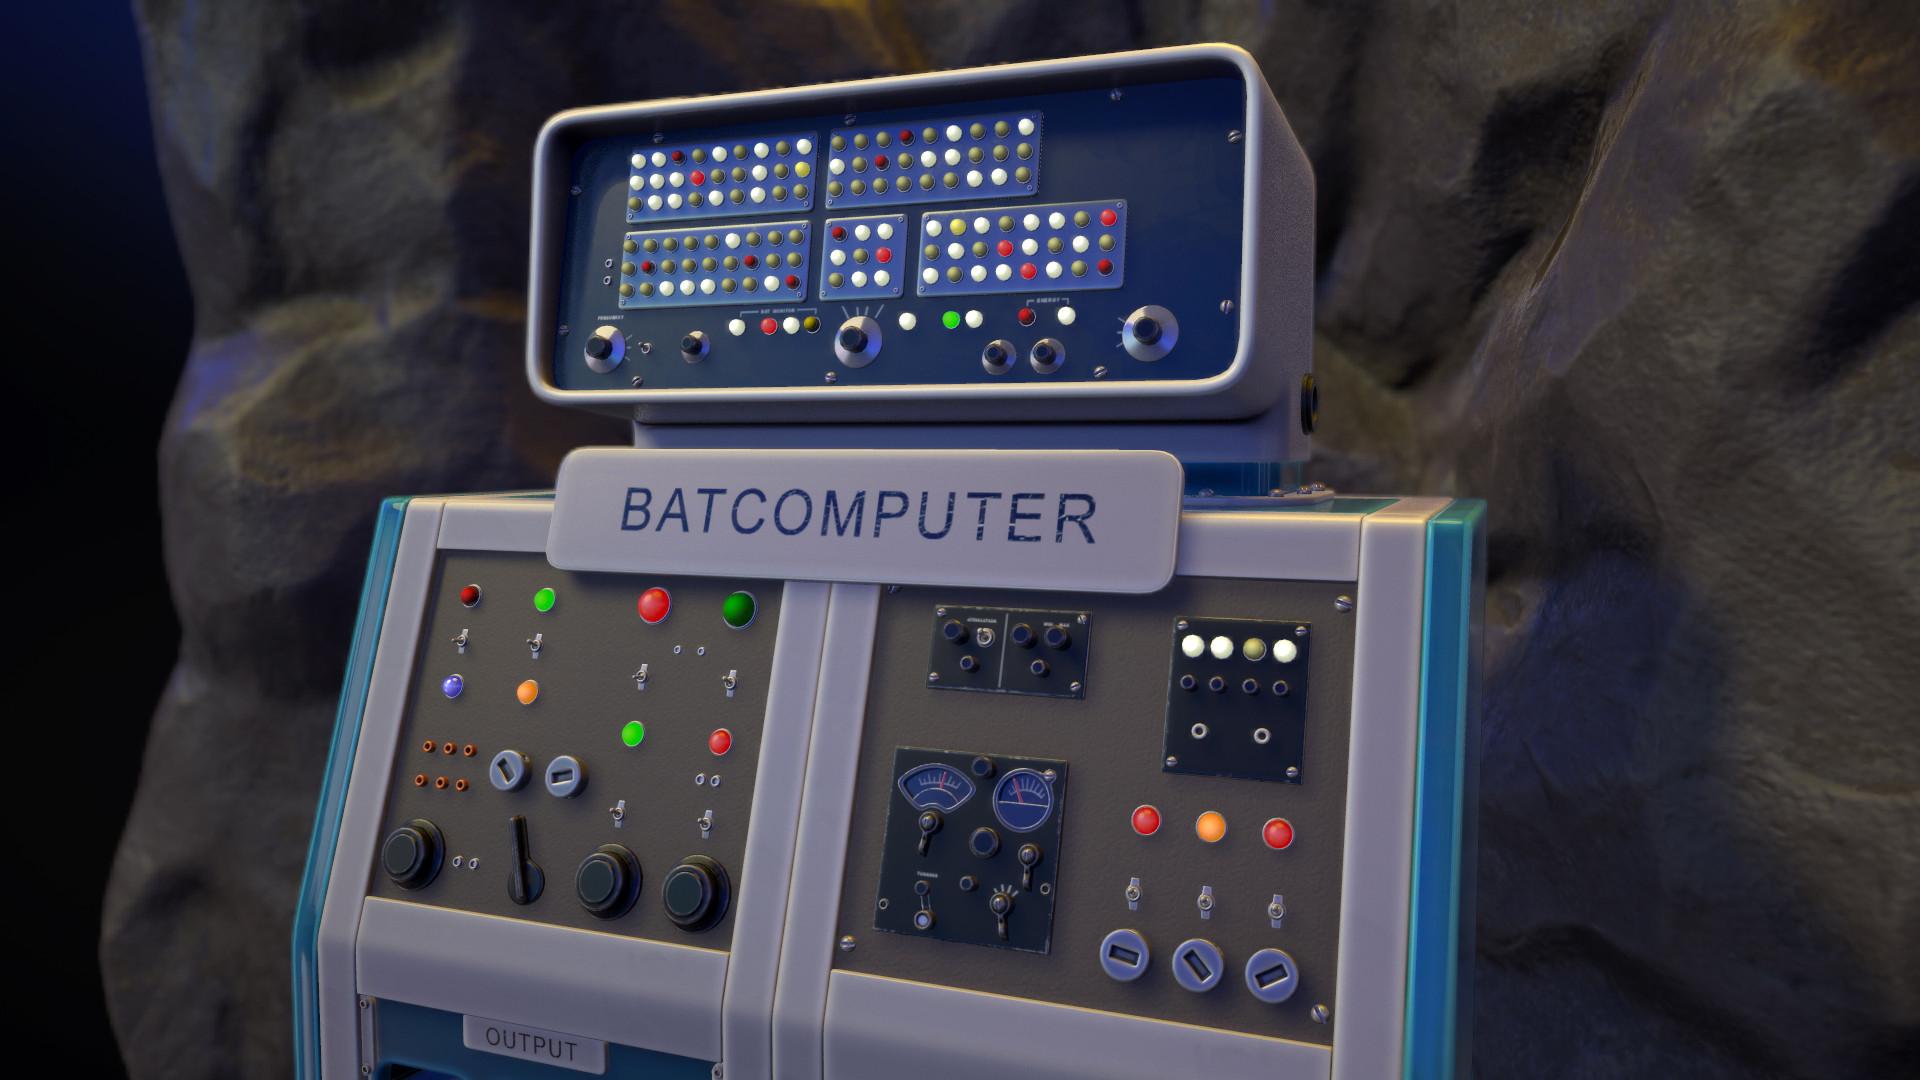 erik-mckenney-1966-batcomputer-final-stylized-b-01.jpg?1518289631